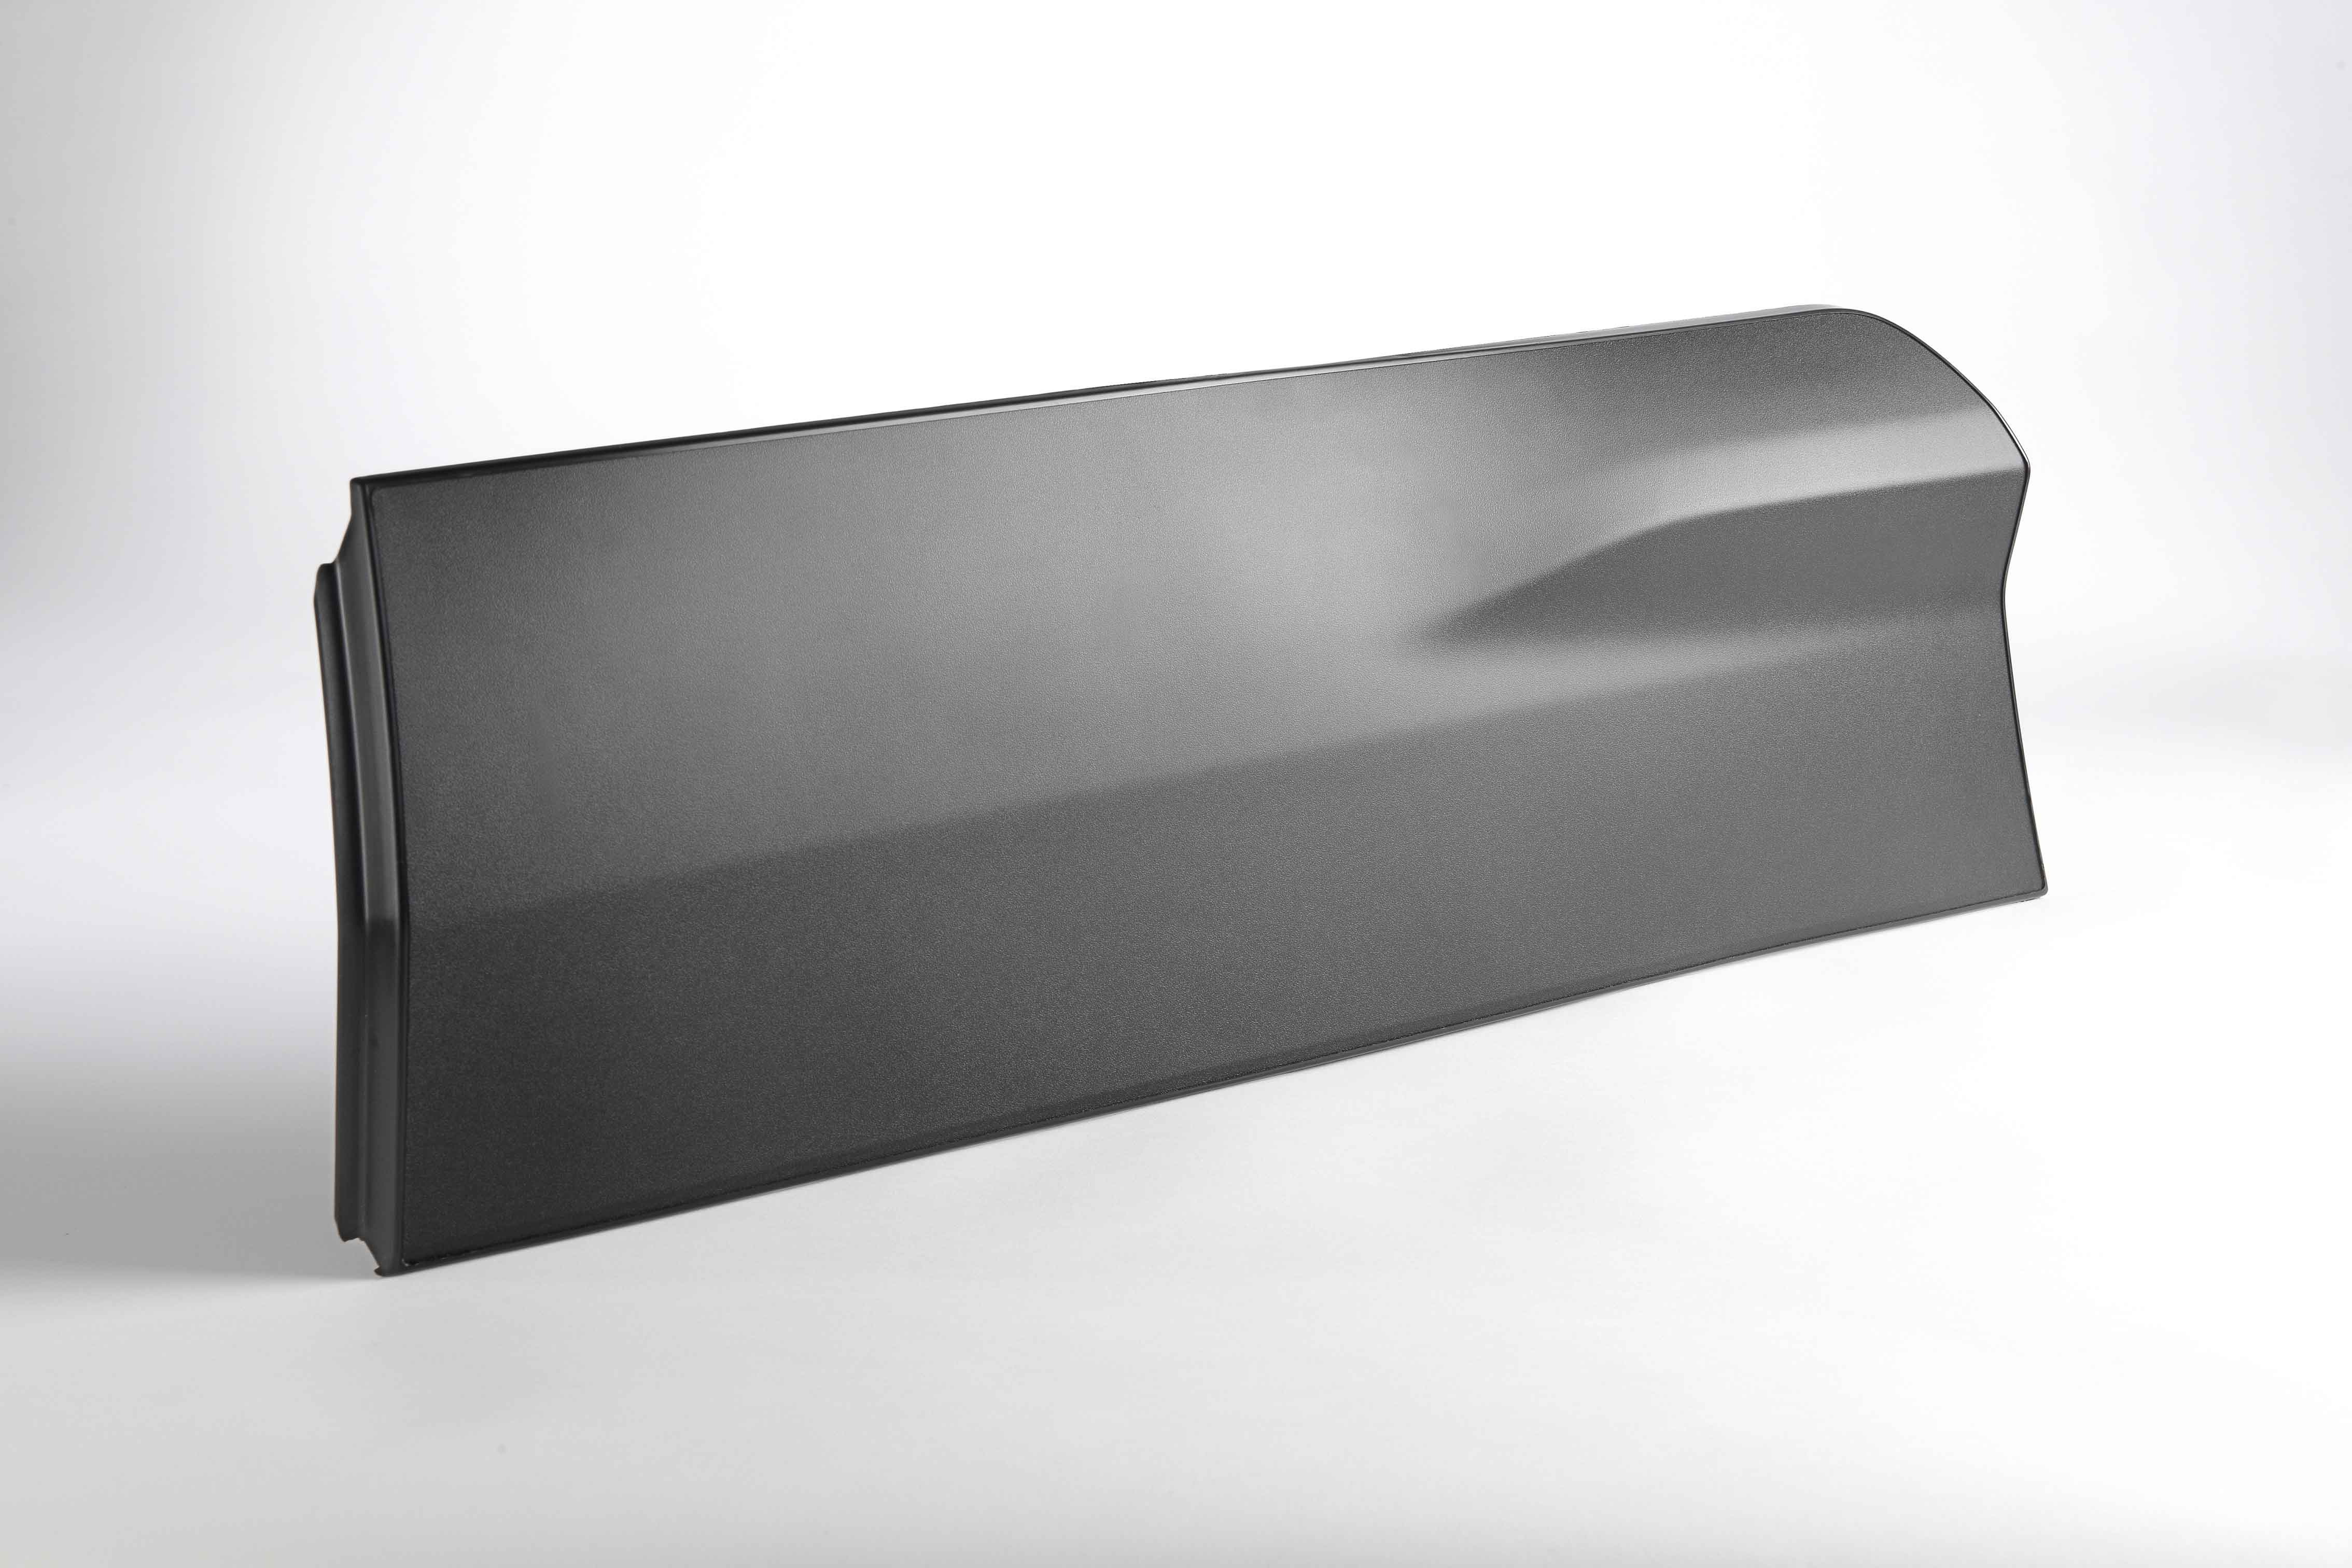 Milliken puts lightweight and sustainability in the spotlight at VDI Plastics in Automotive Engineering 2014